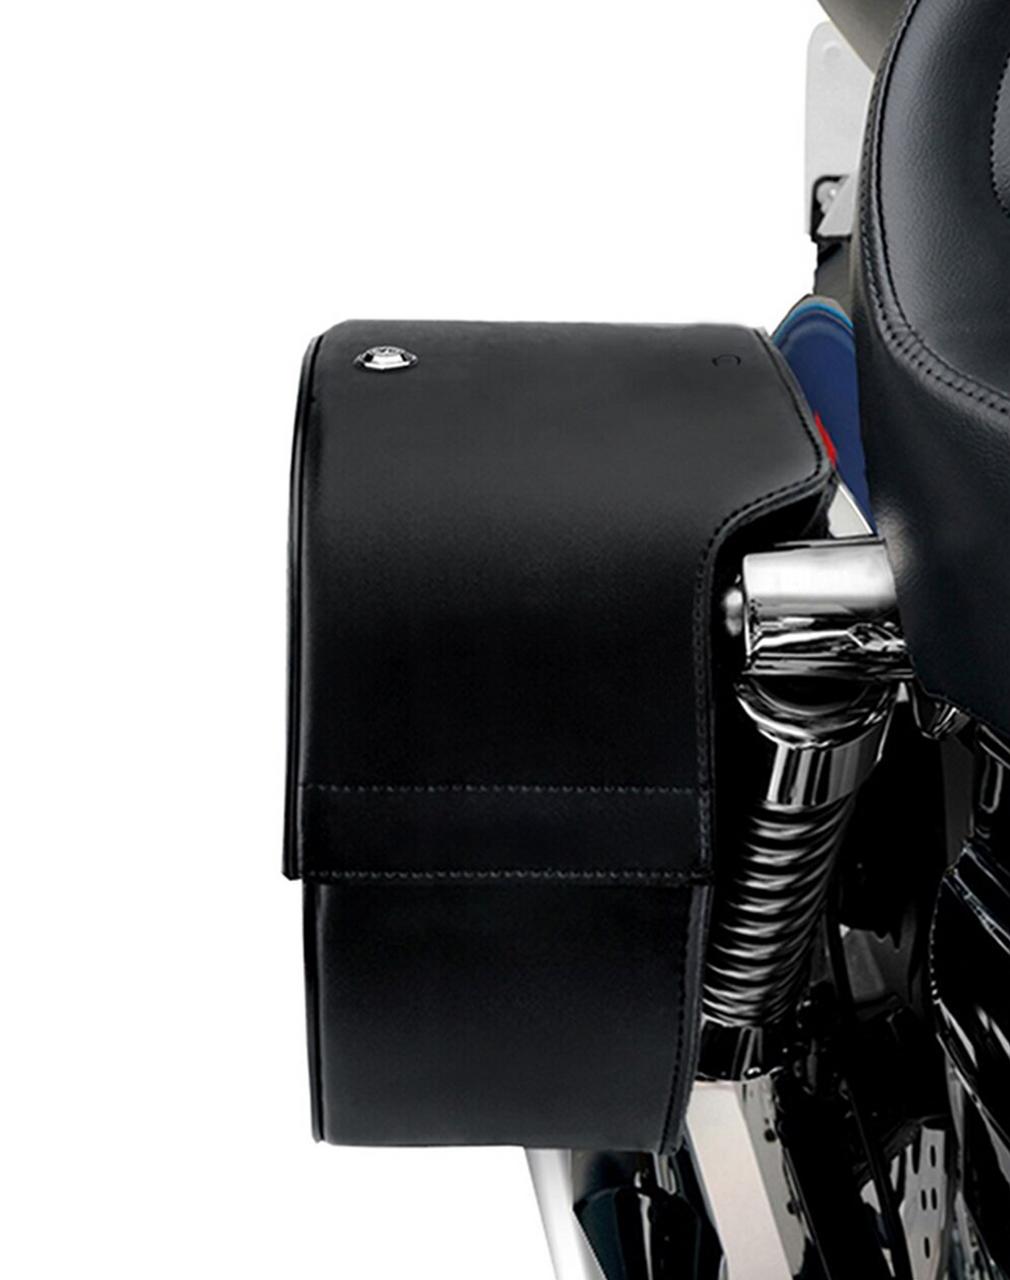 VikingBags Battlecry Large Shock Cutout Kawasaki Vulcan 750 Leather Motorcycle Saddlebags Shock Cutout View